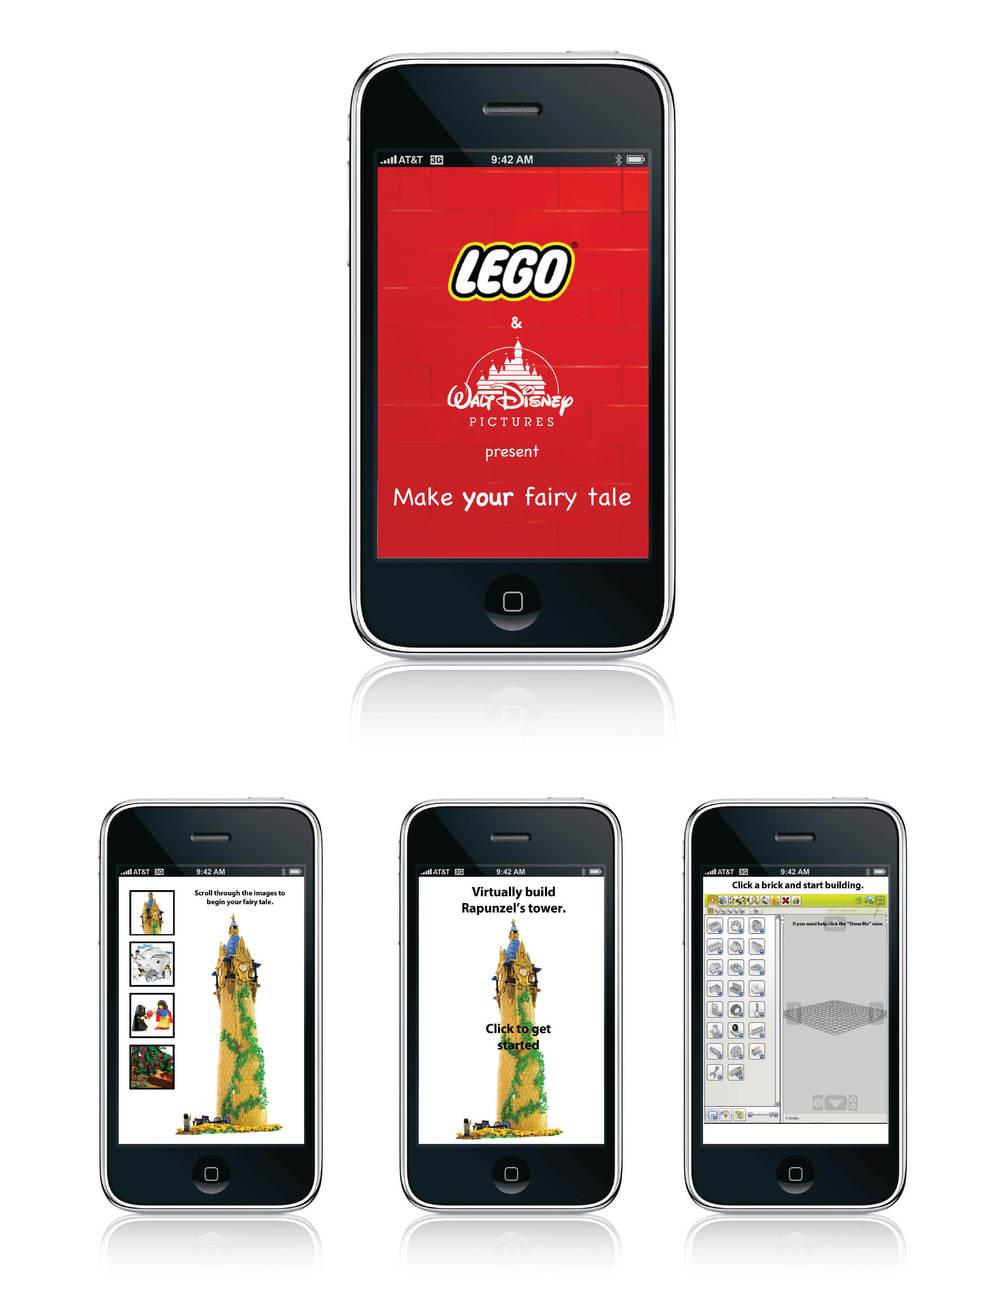 Lego_Princess_IPhoneApp.jpg